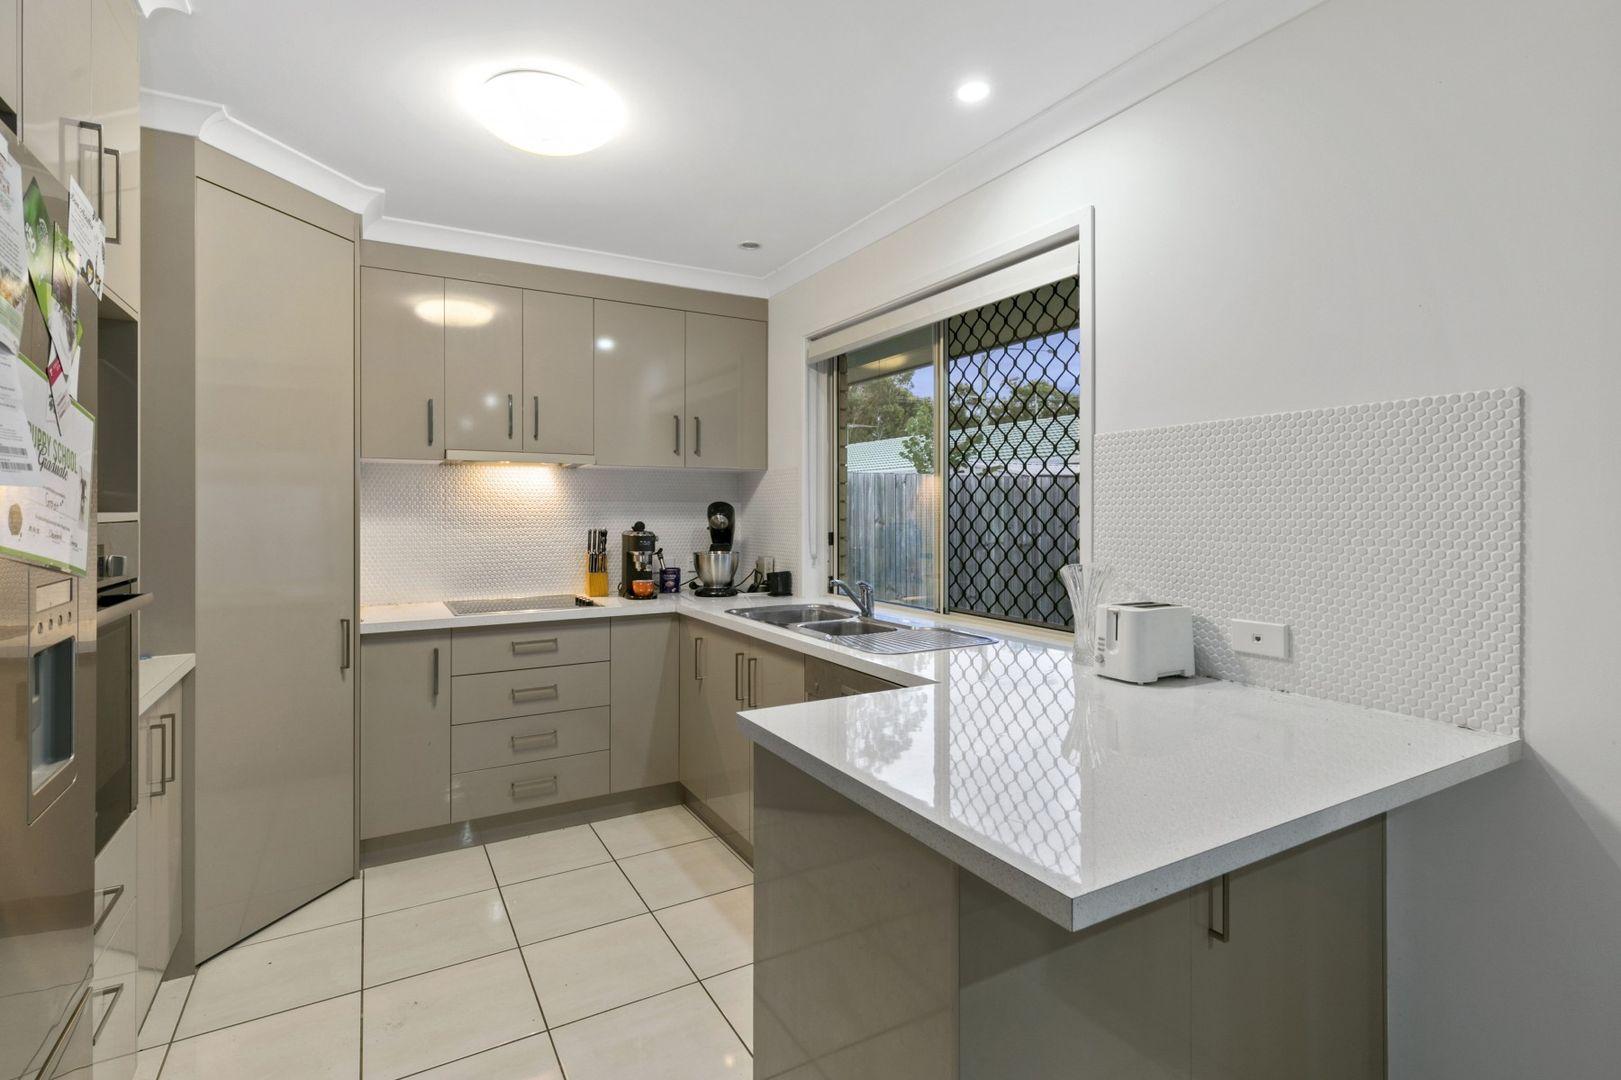 1/22 Nottinghill Street, Birkdale QLD 4159, Image 1